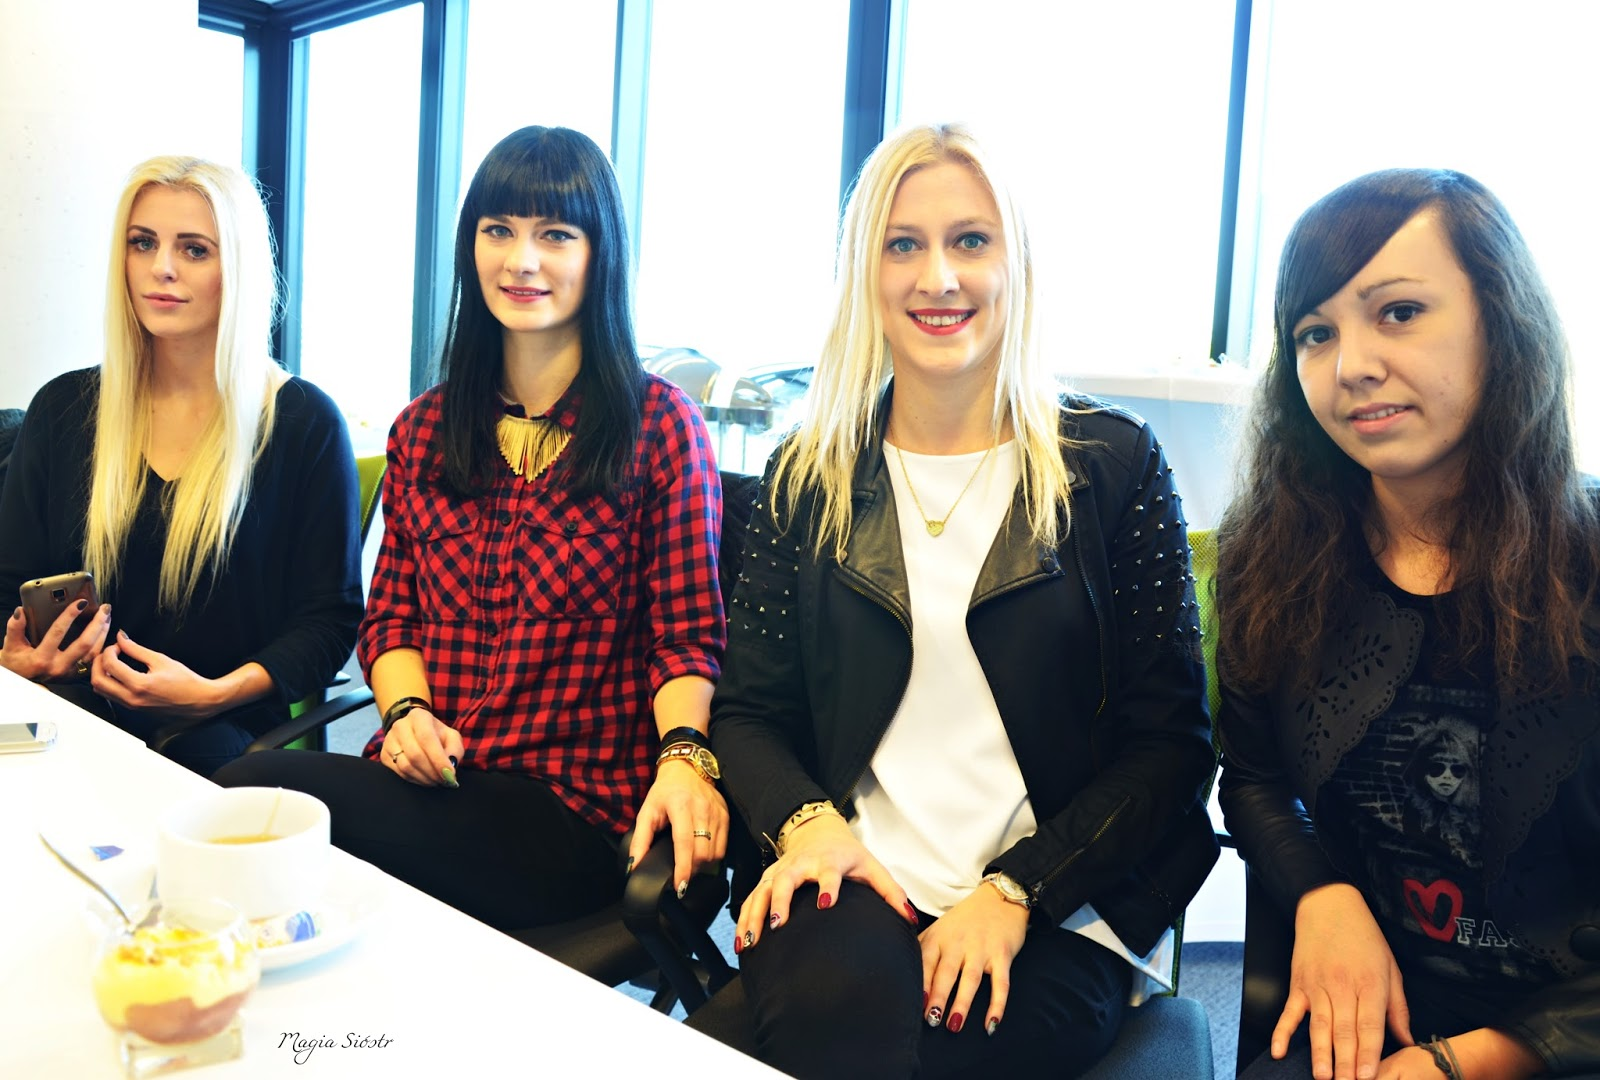 polskie blogerki, blogerki modowe, blogerki urodowe